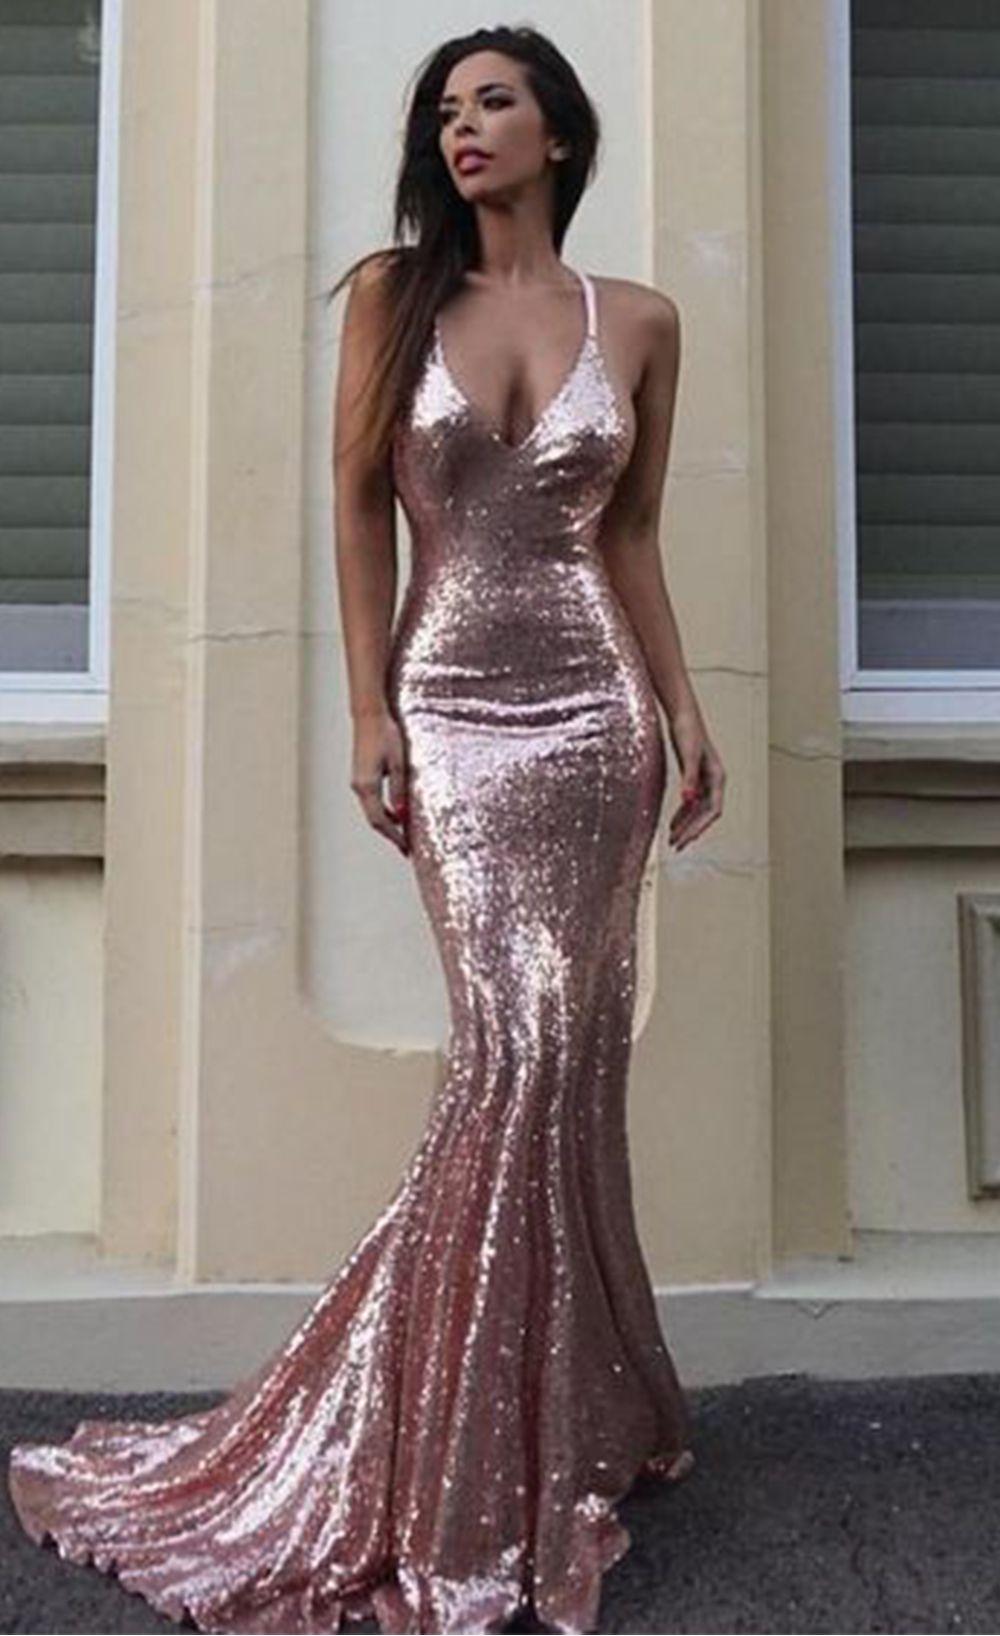 sexy halter vneck party sequin maxi dress you fancy huh